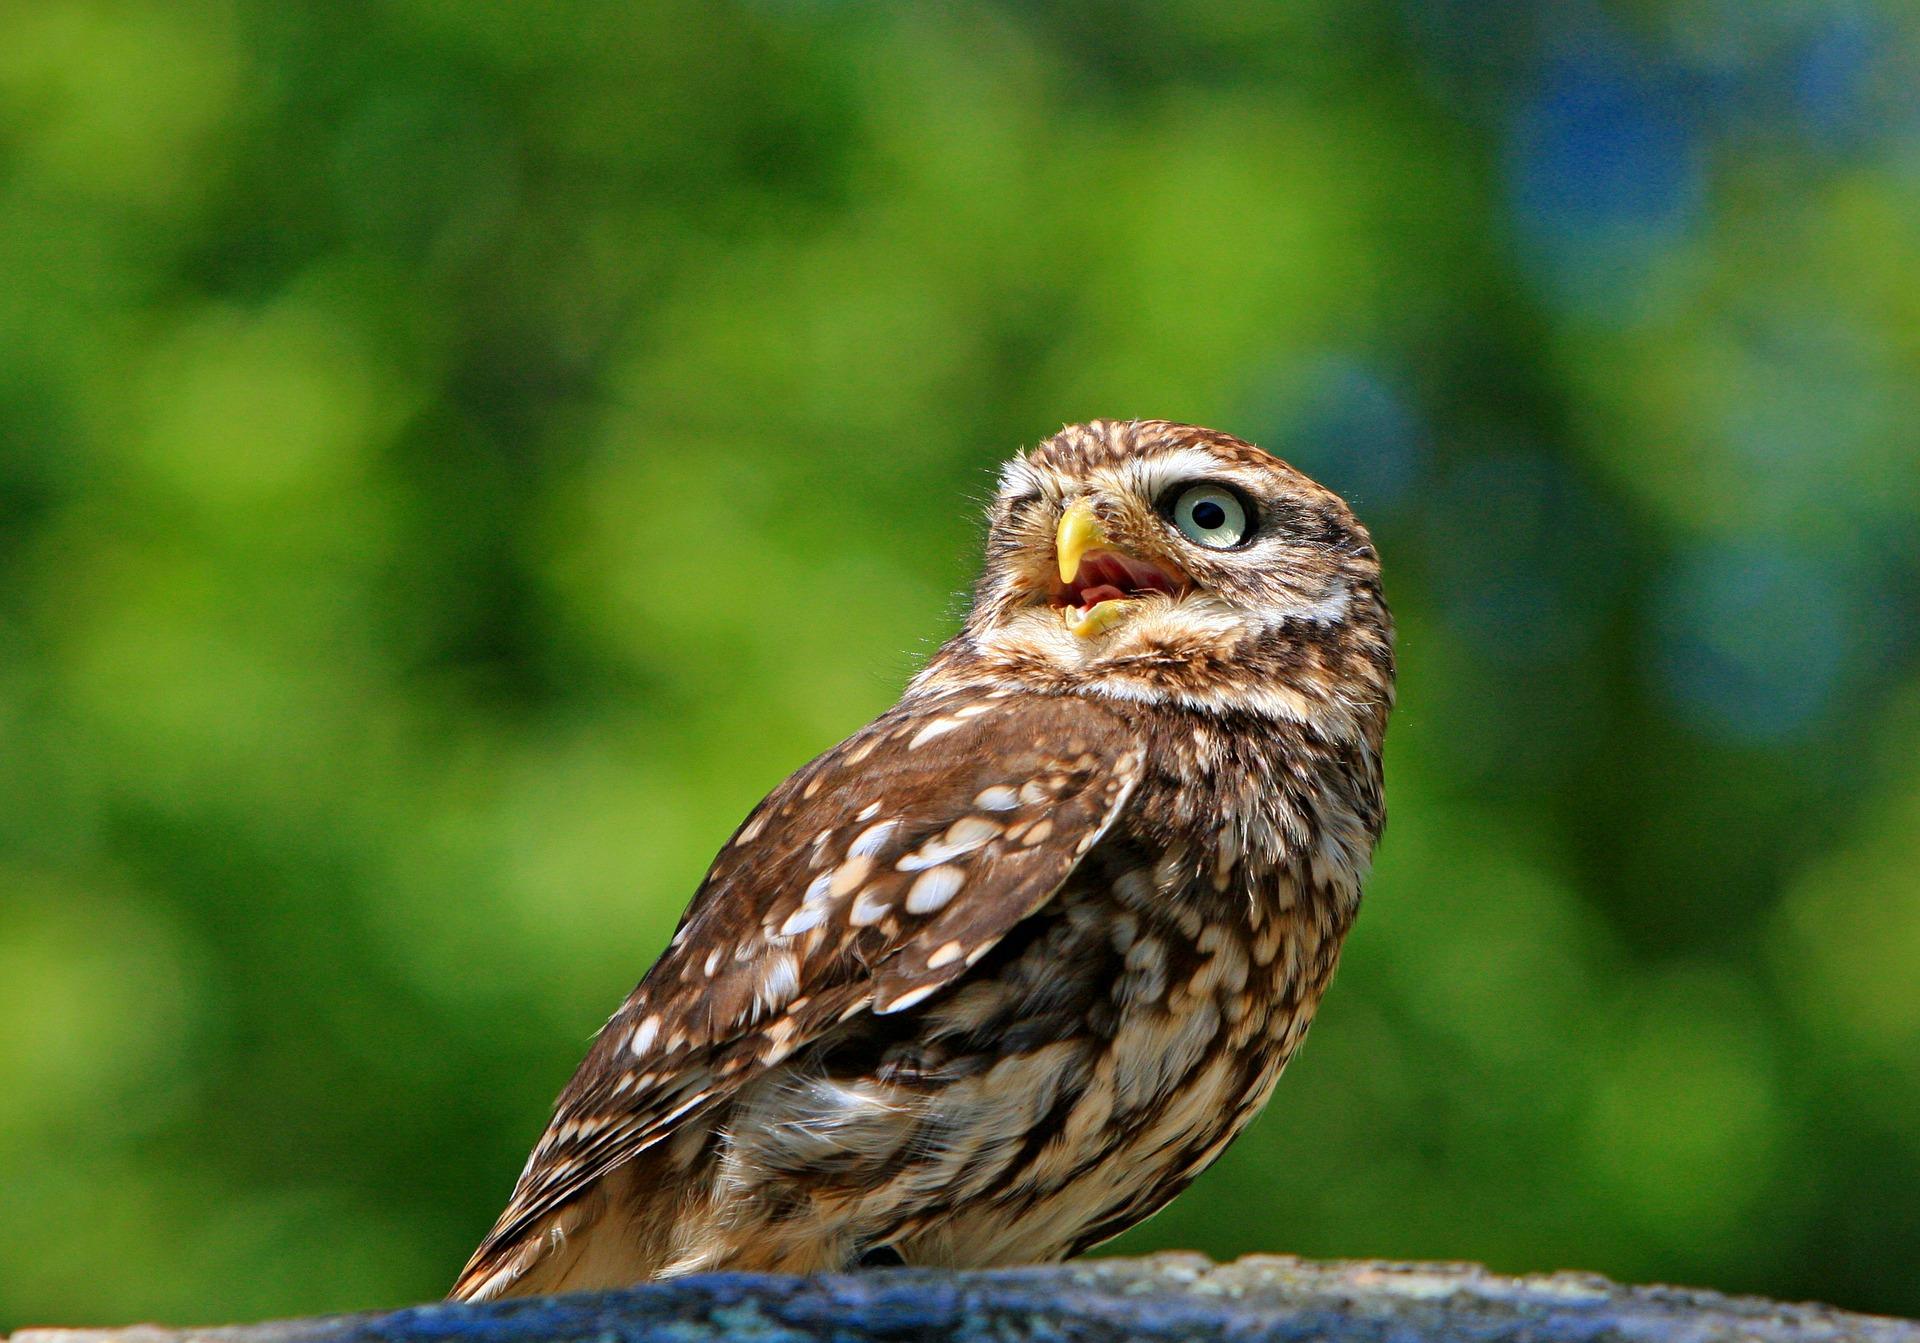 owl-275940_1920.jpg